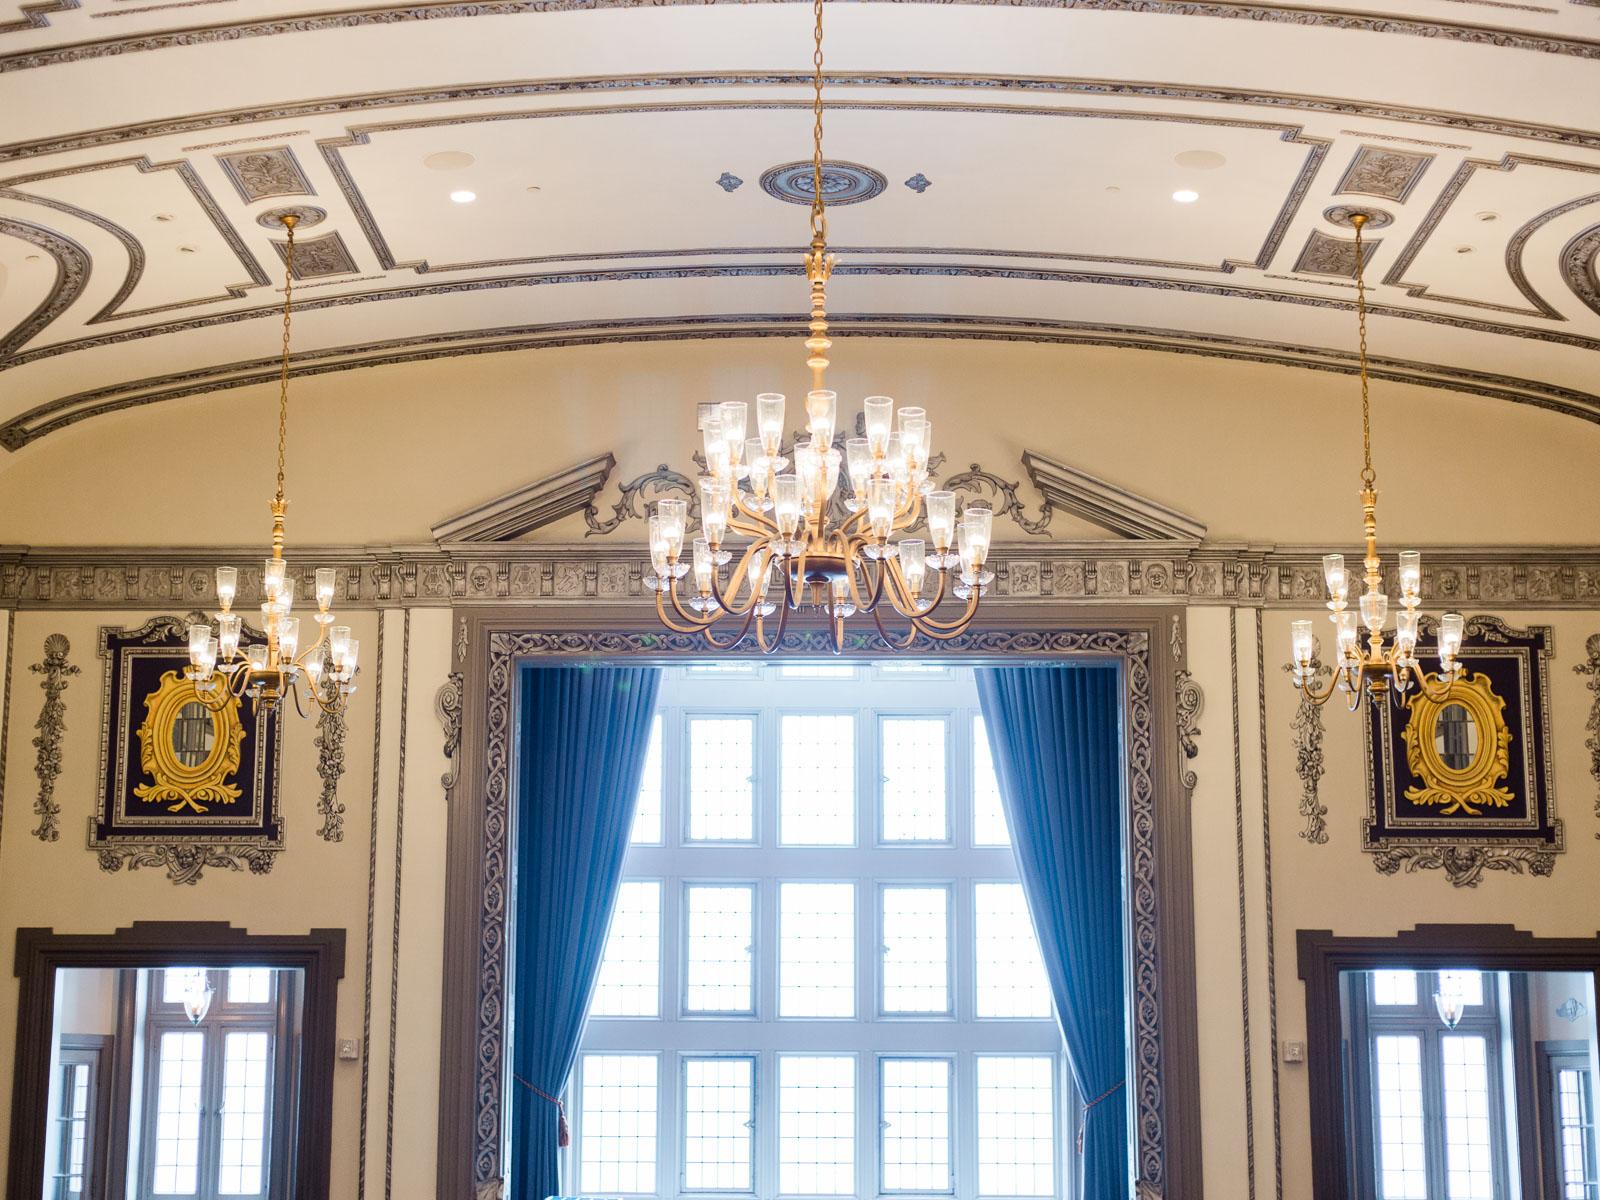 tudor-arms-hotel-cleveland-wedding-venue-photos-by-matt-erickson-photography-1.jpg